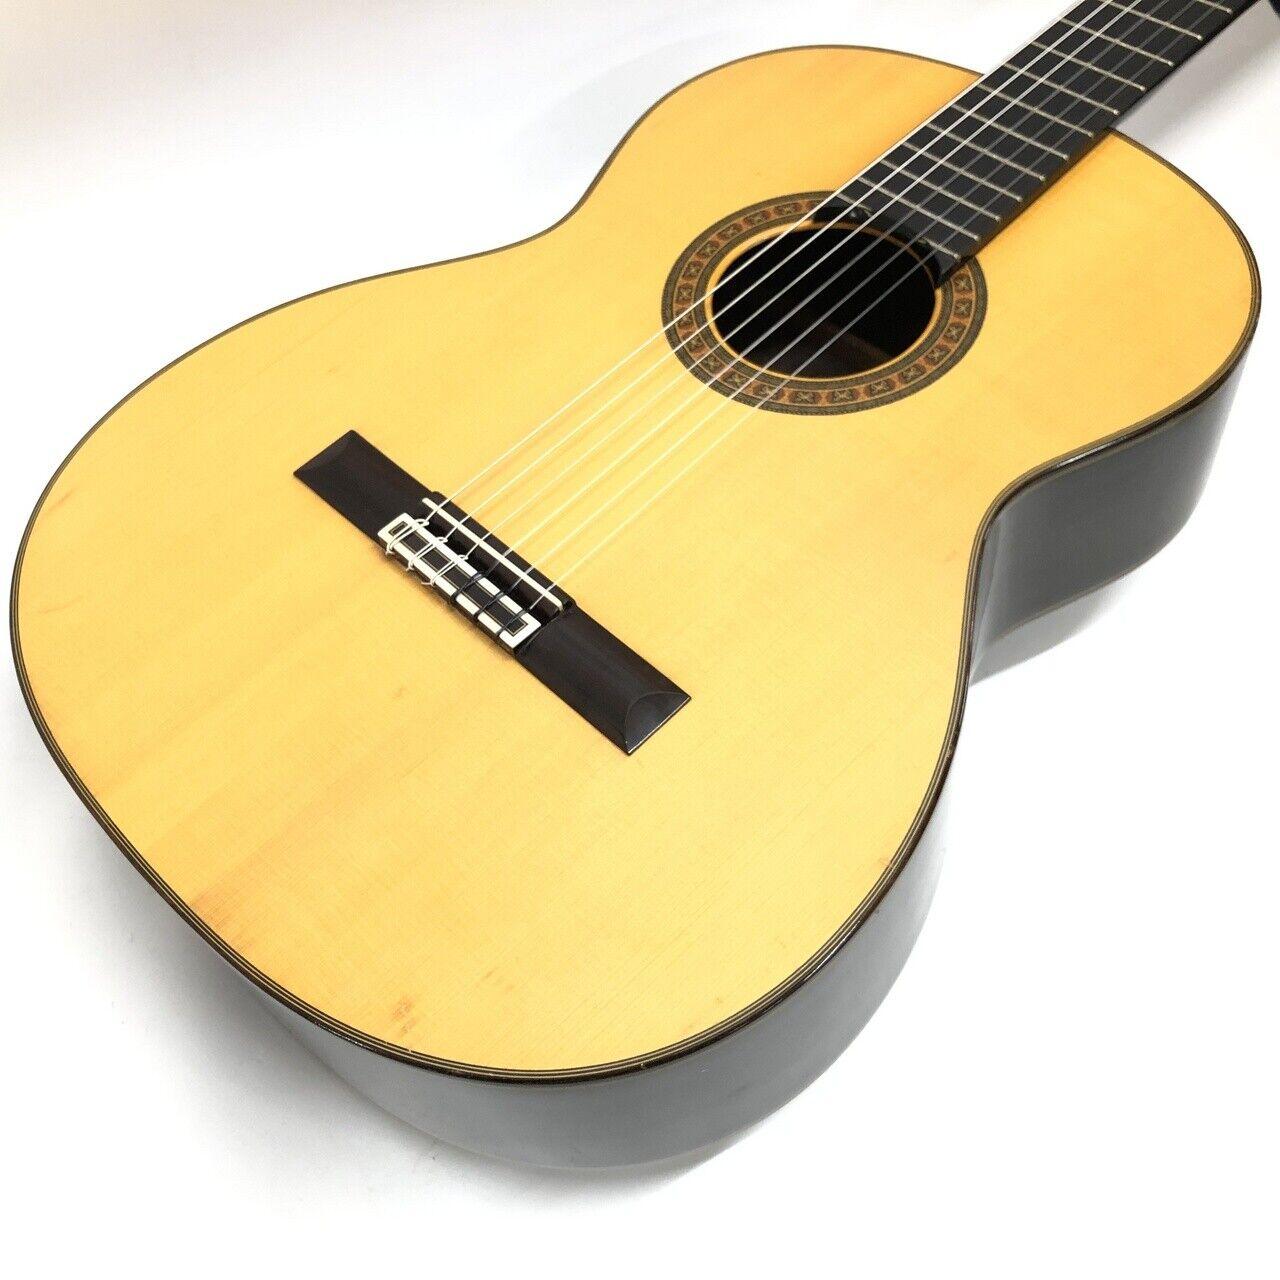 ASTURIAS A-10 acoustic guitar Japan rare beautiful vintage popular EMS F   S